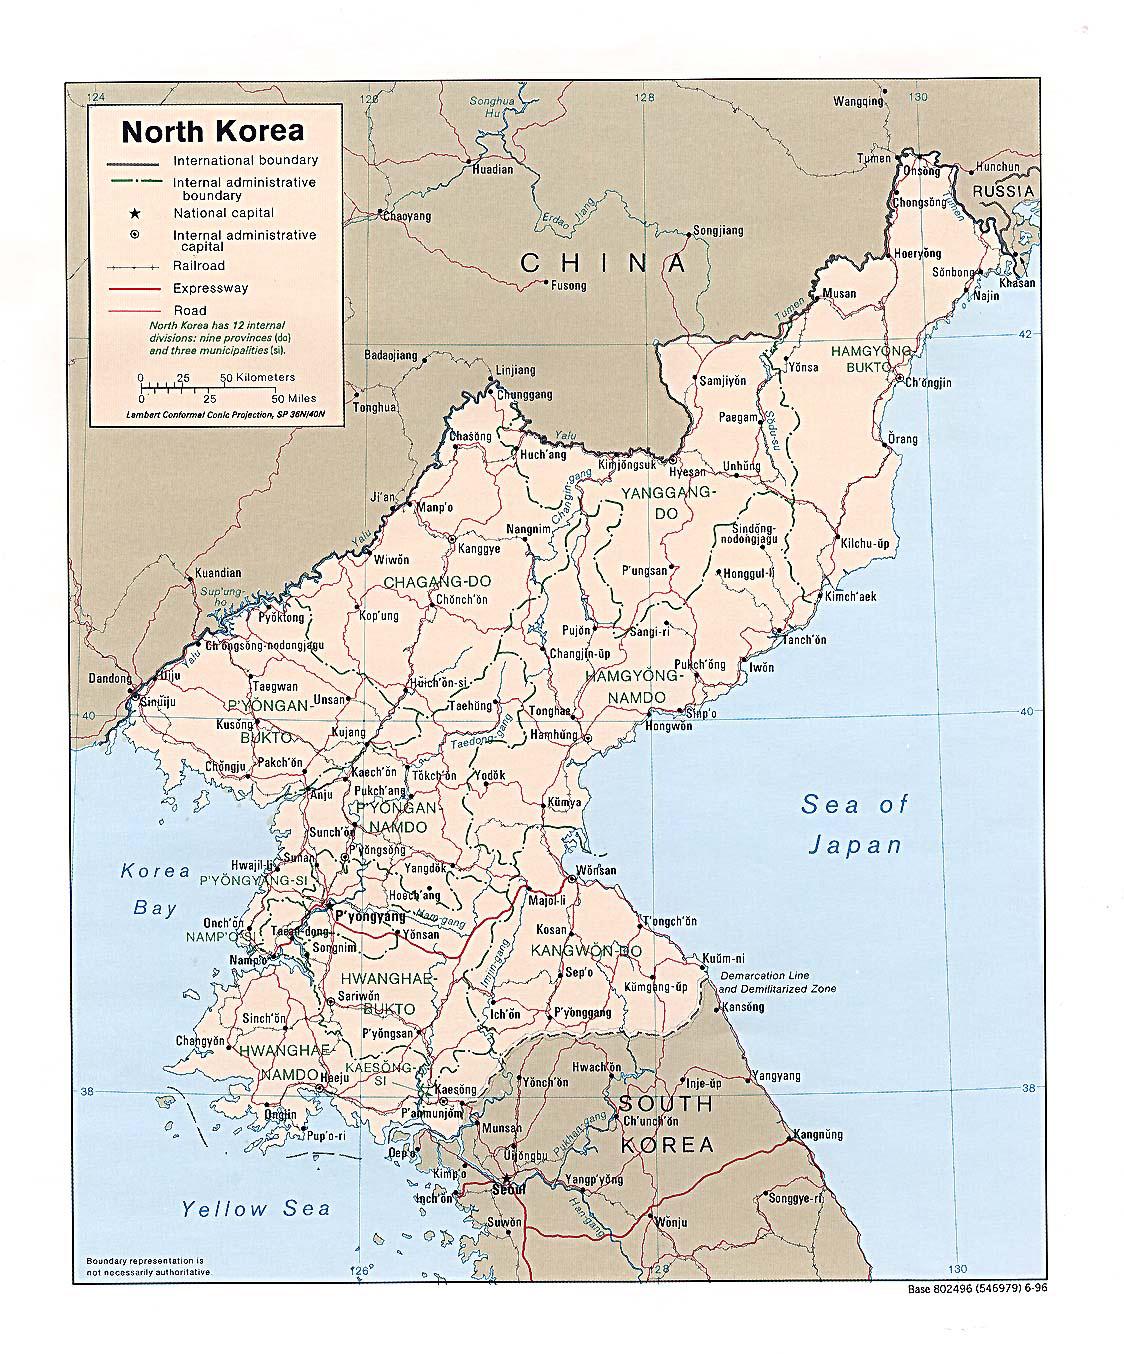 Detailed administrative and road map of North Korea North Korea